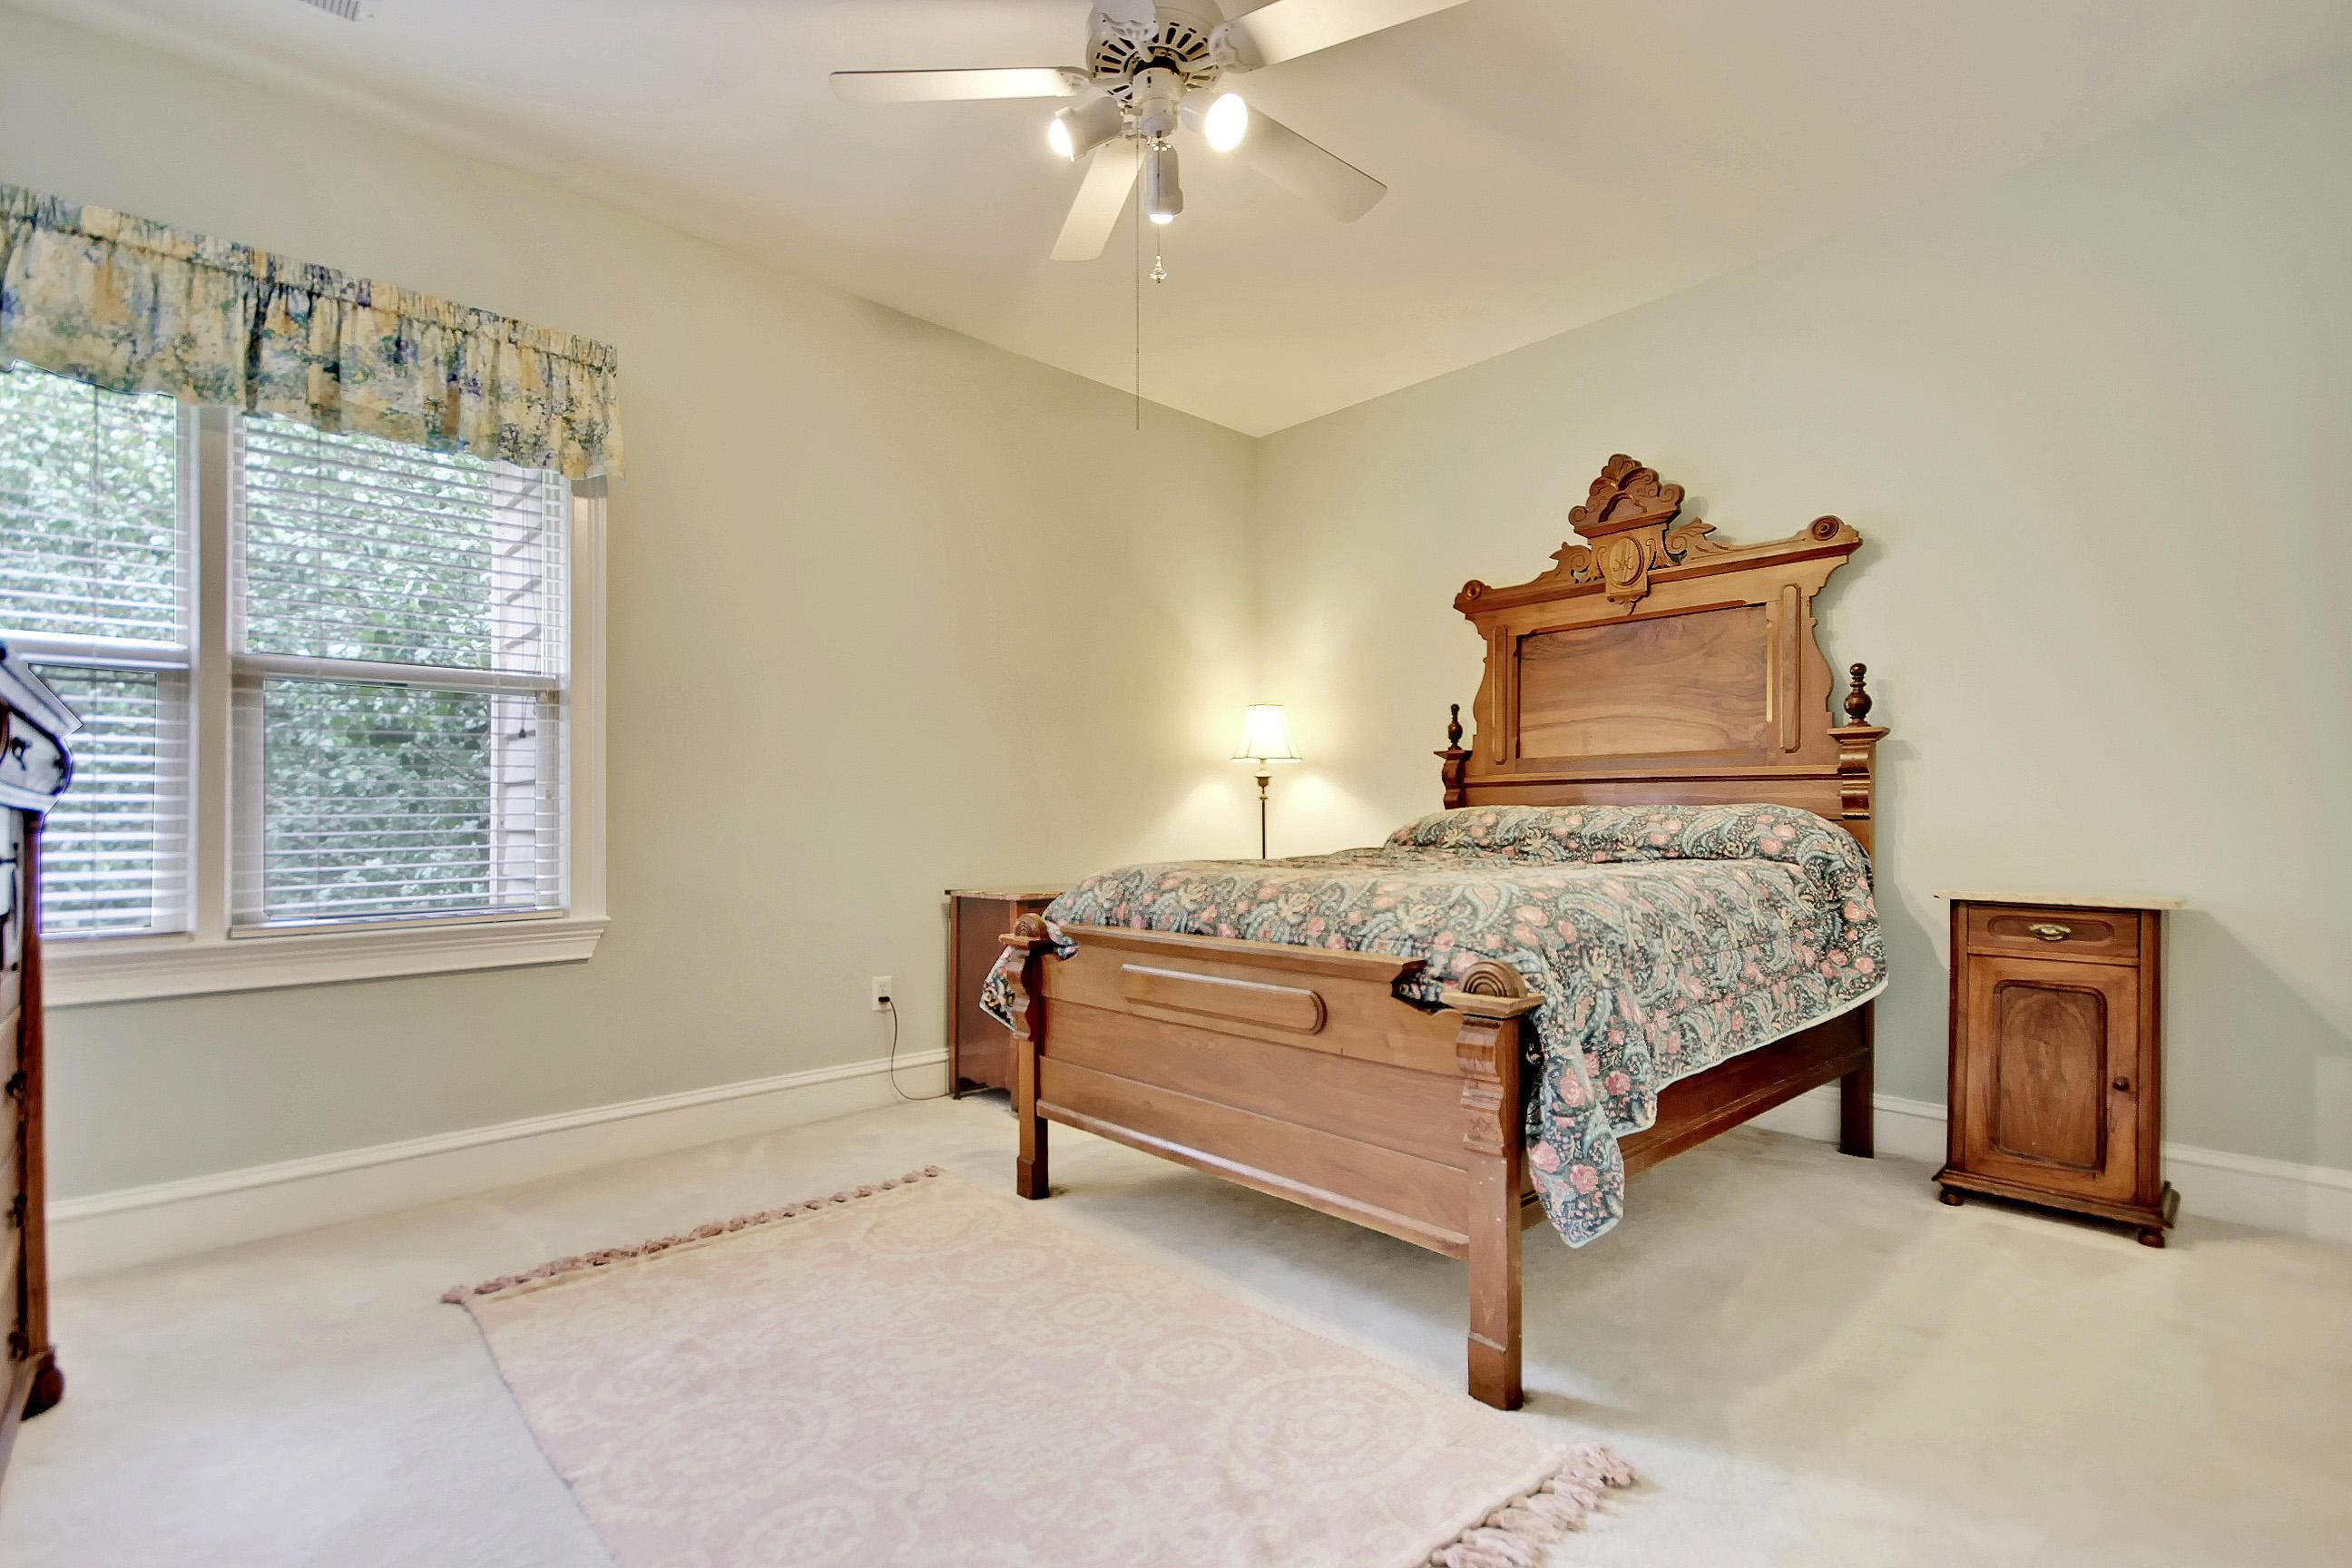 Dunes West Homes For Sale - 3463 Colonel Vanderhorst, Mount Pleasant, SC - 16